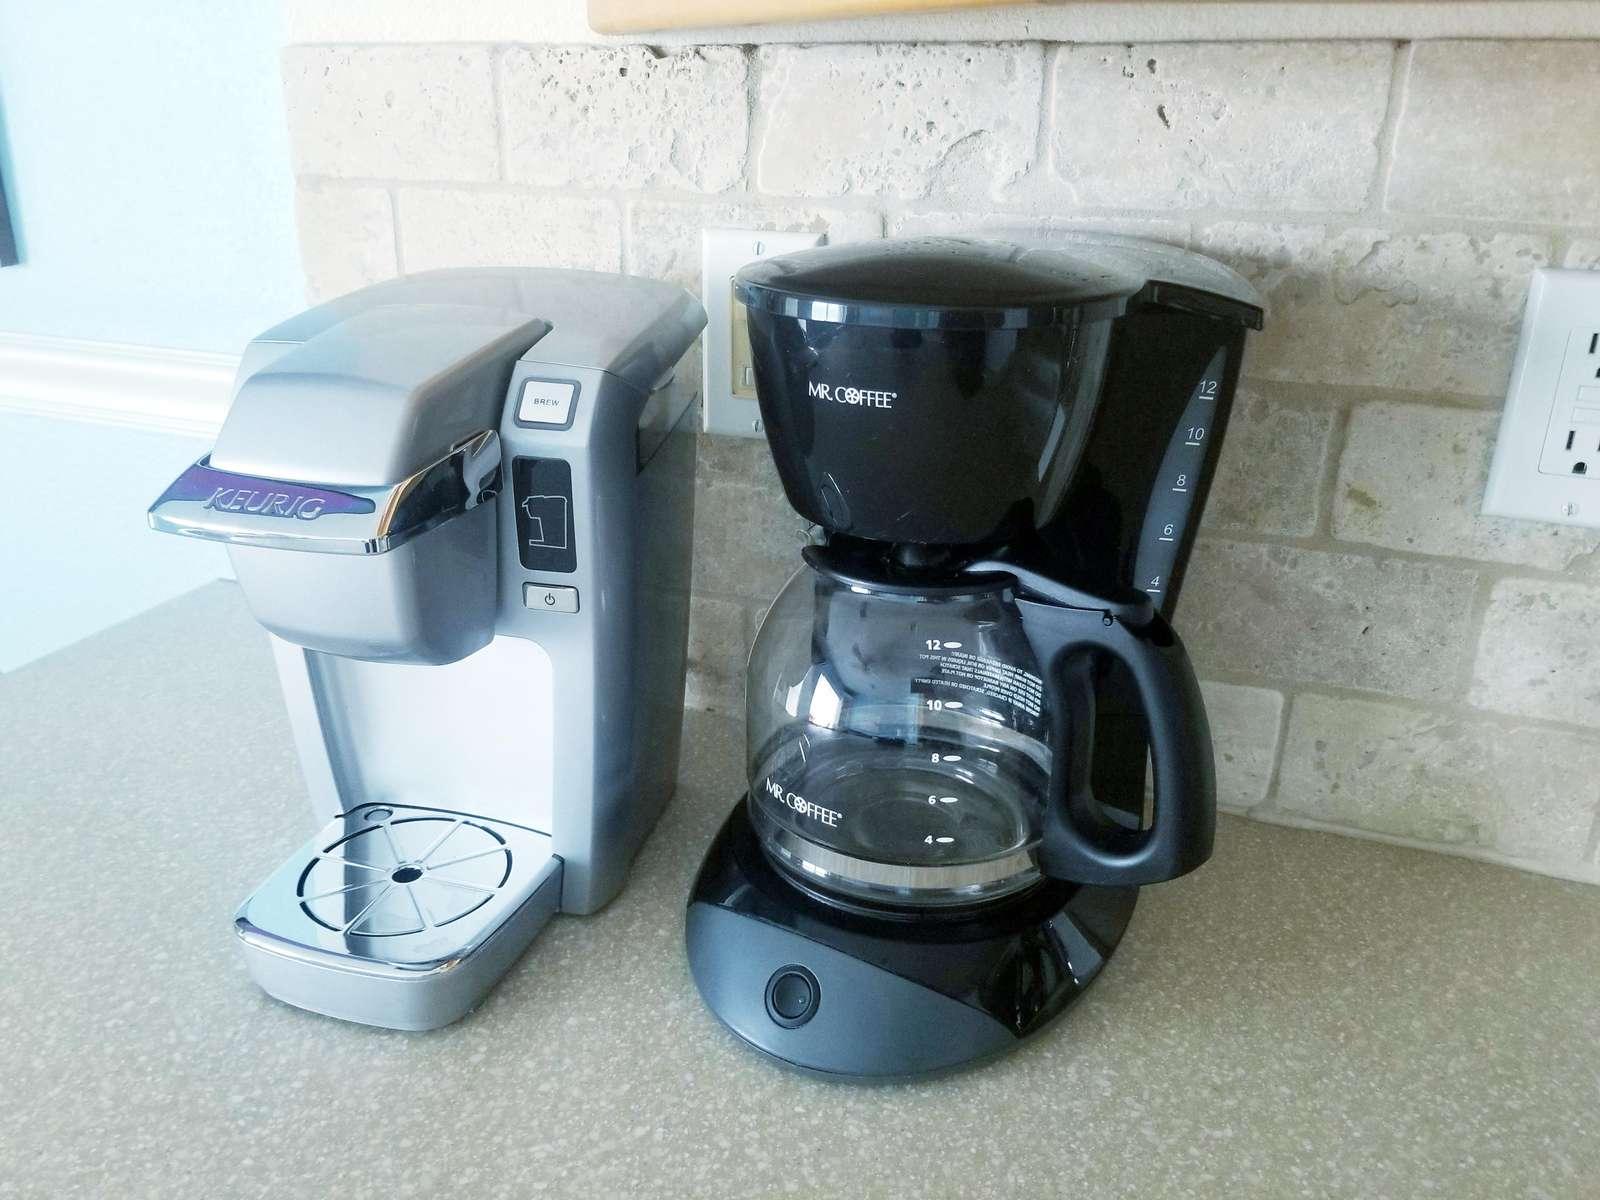 Coffee your way! Keurig or Drip Coffee Maker